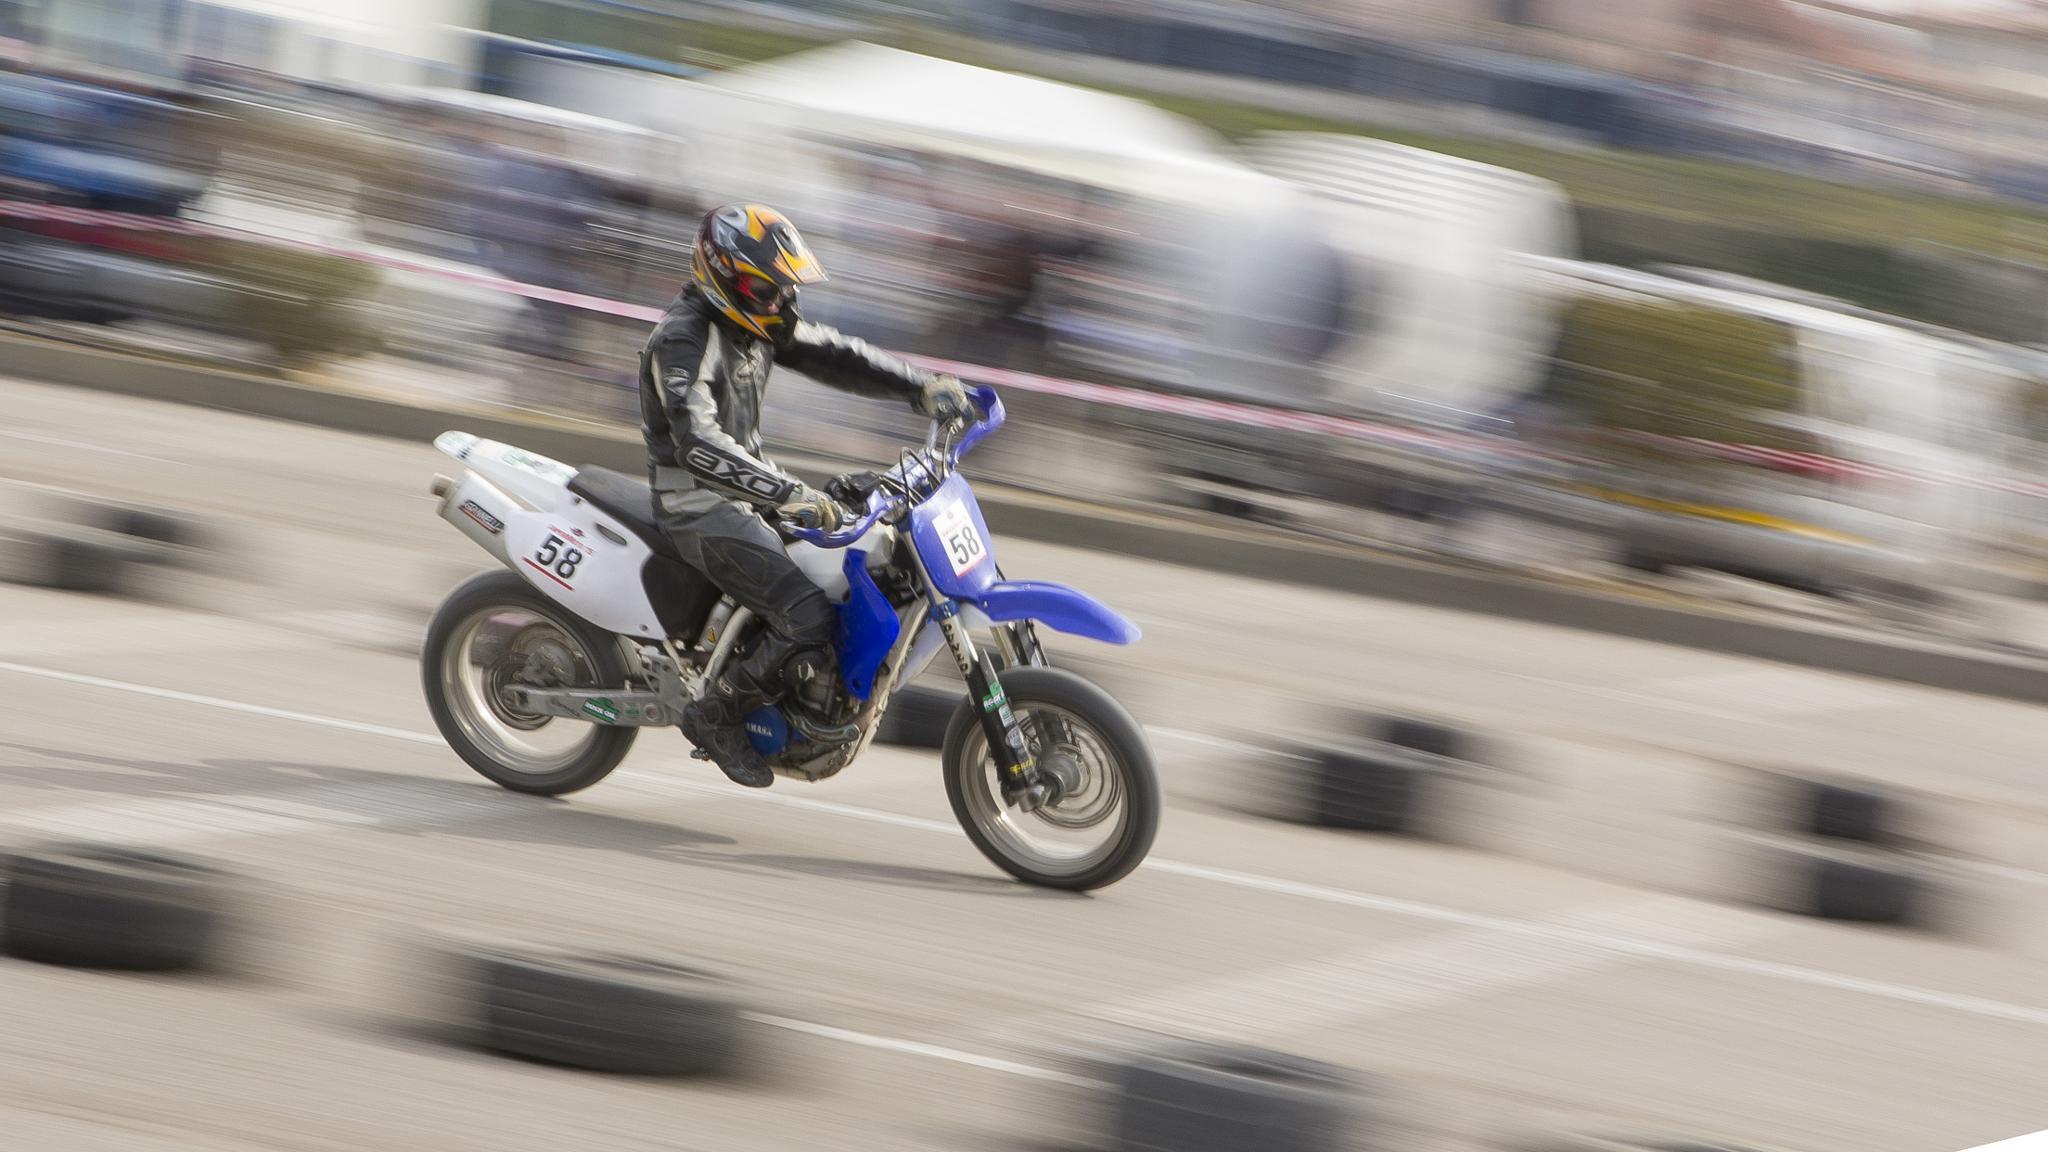 Motorbike Racer Guy by AniBarjami